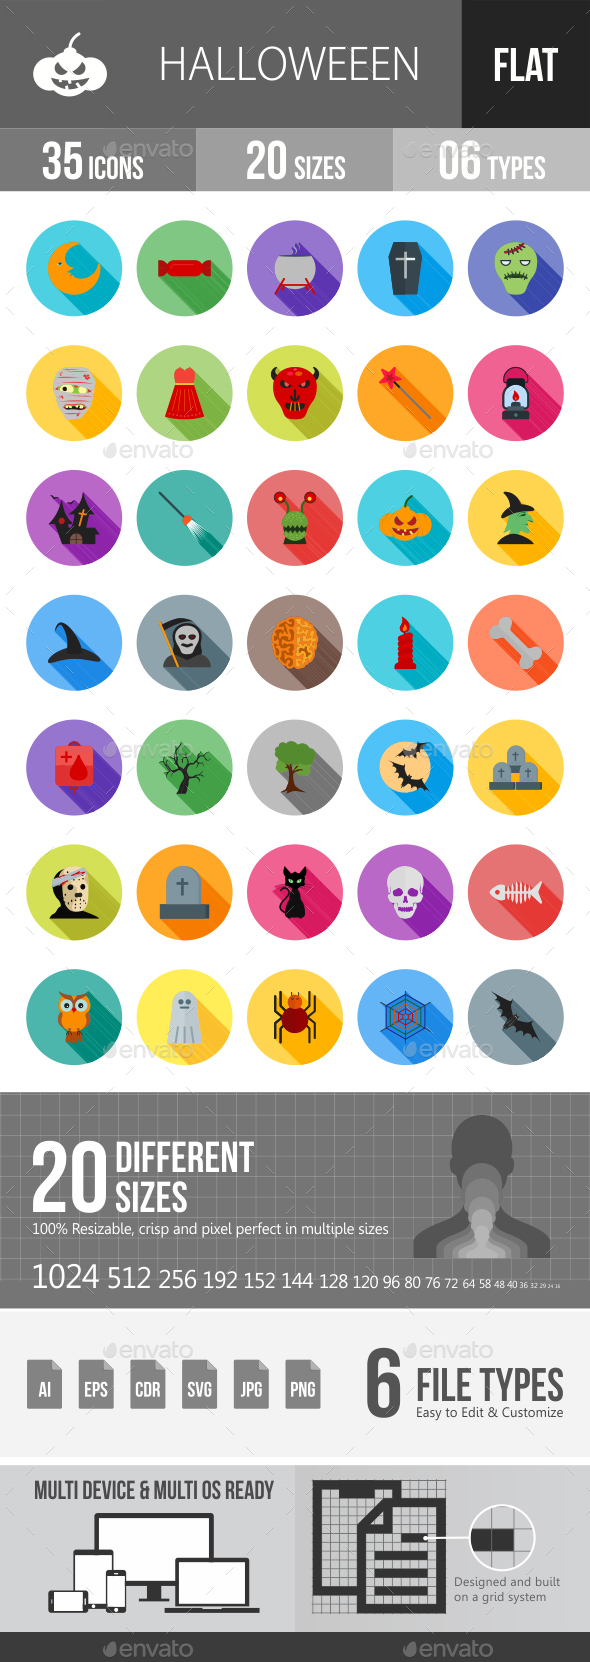 Halloween Flat Shadowed Icons - Icons